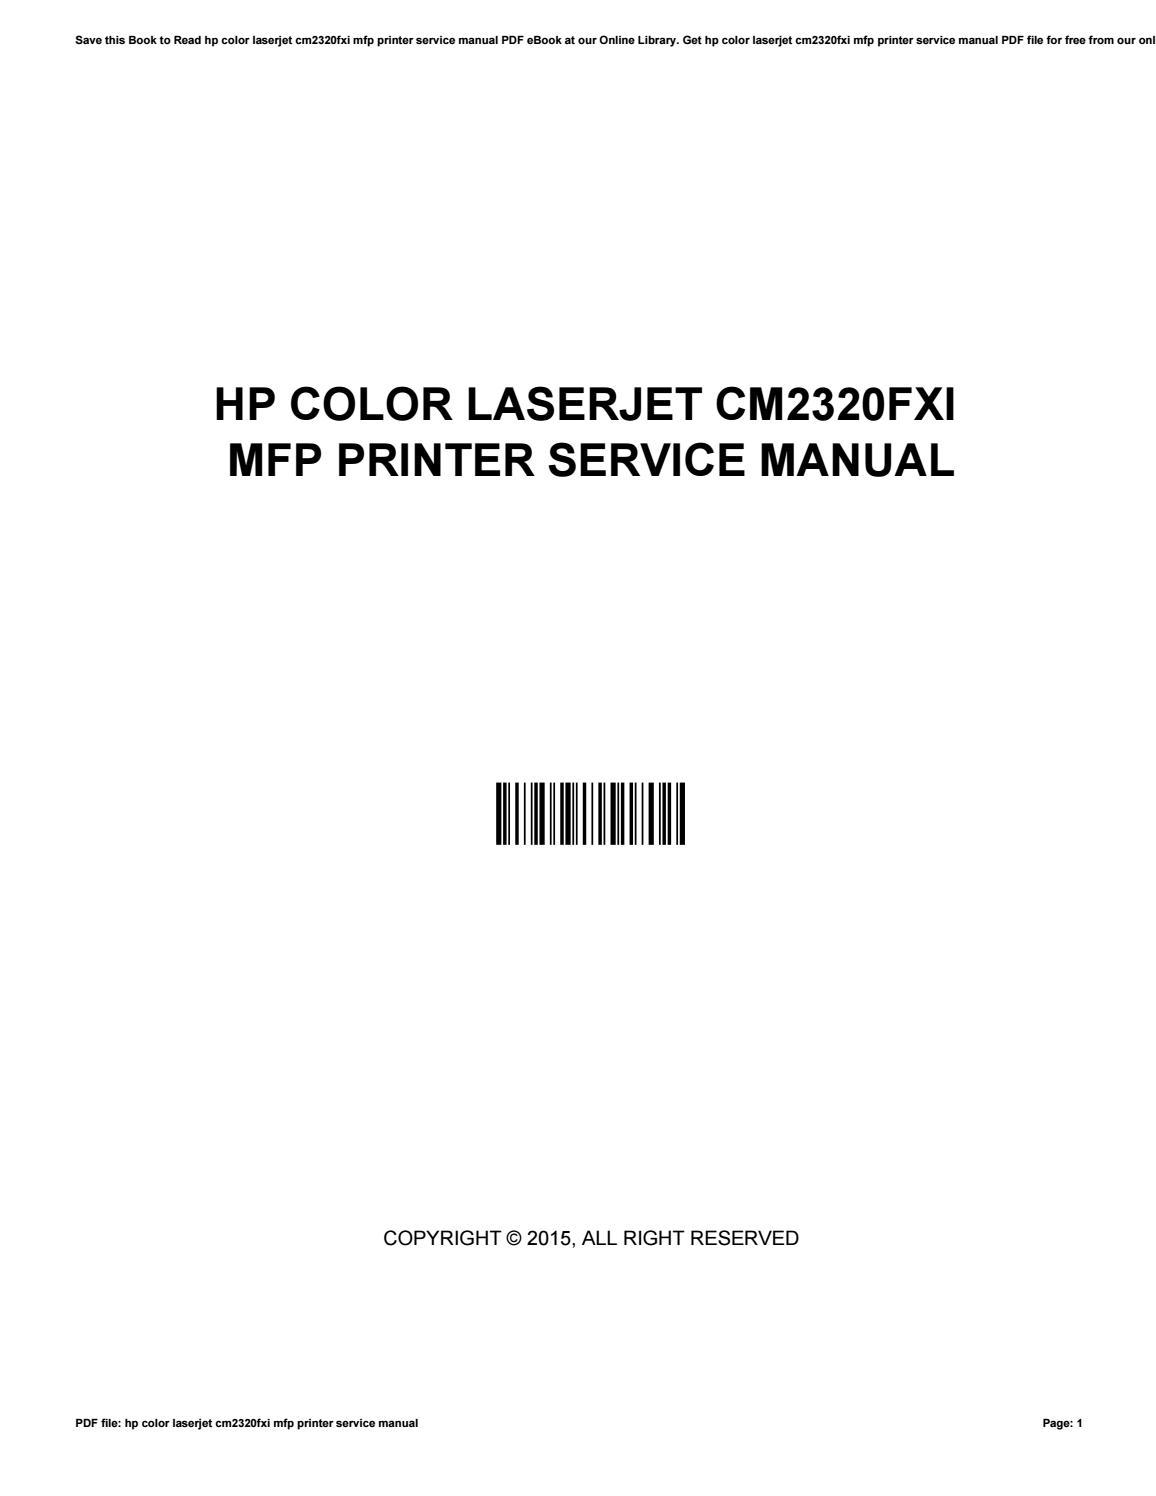 Hp color laserjet cm2320fxi mfp printer service manual by  JonathanVelazquez2755 - issuu